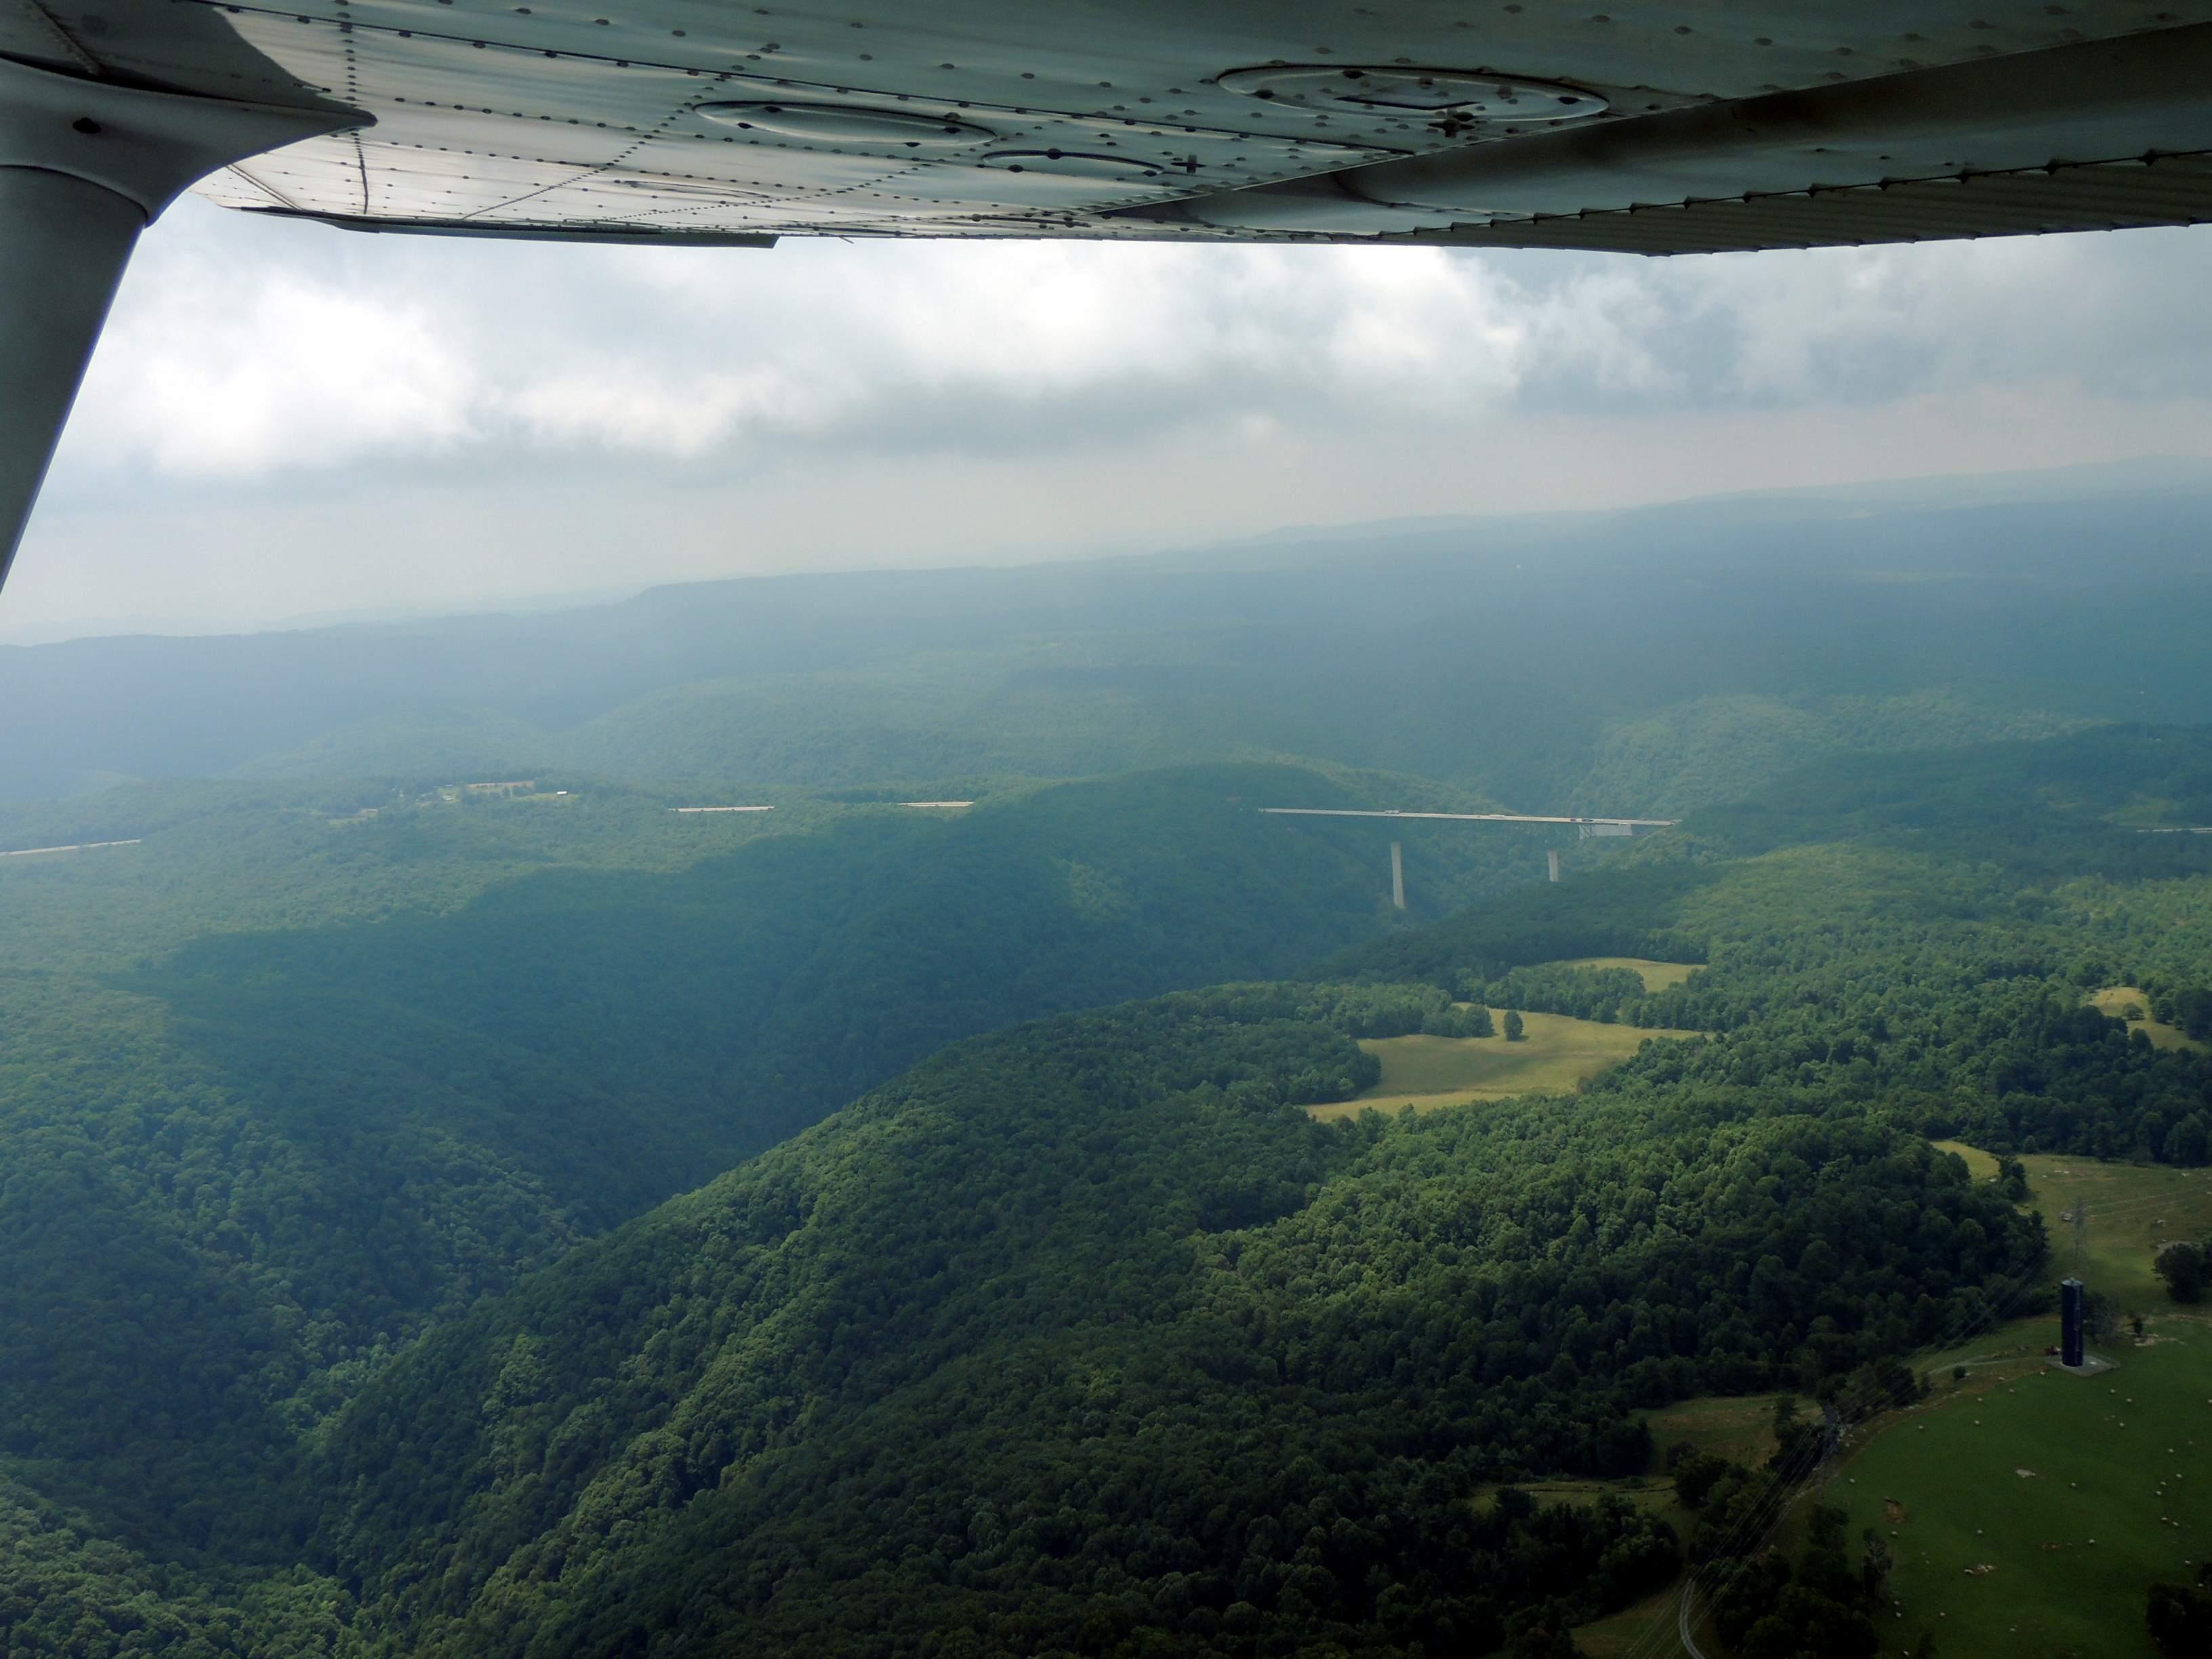 Departing Beckley WV heading for Manassas VA